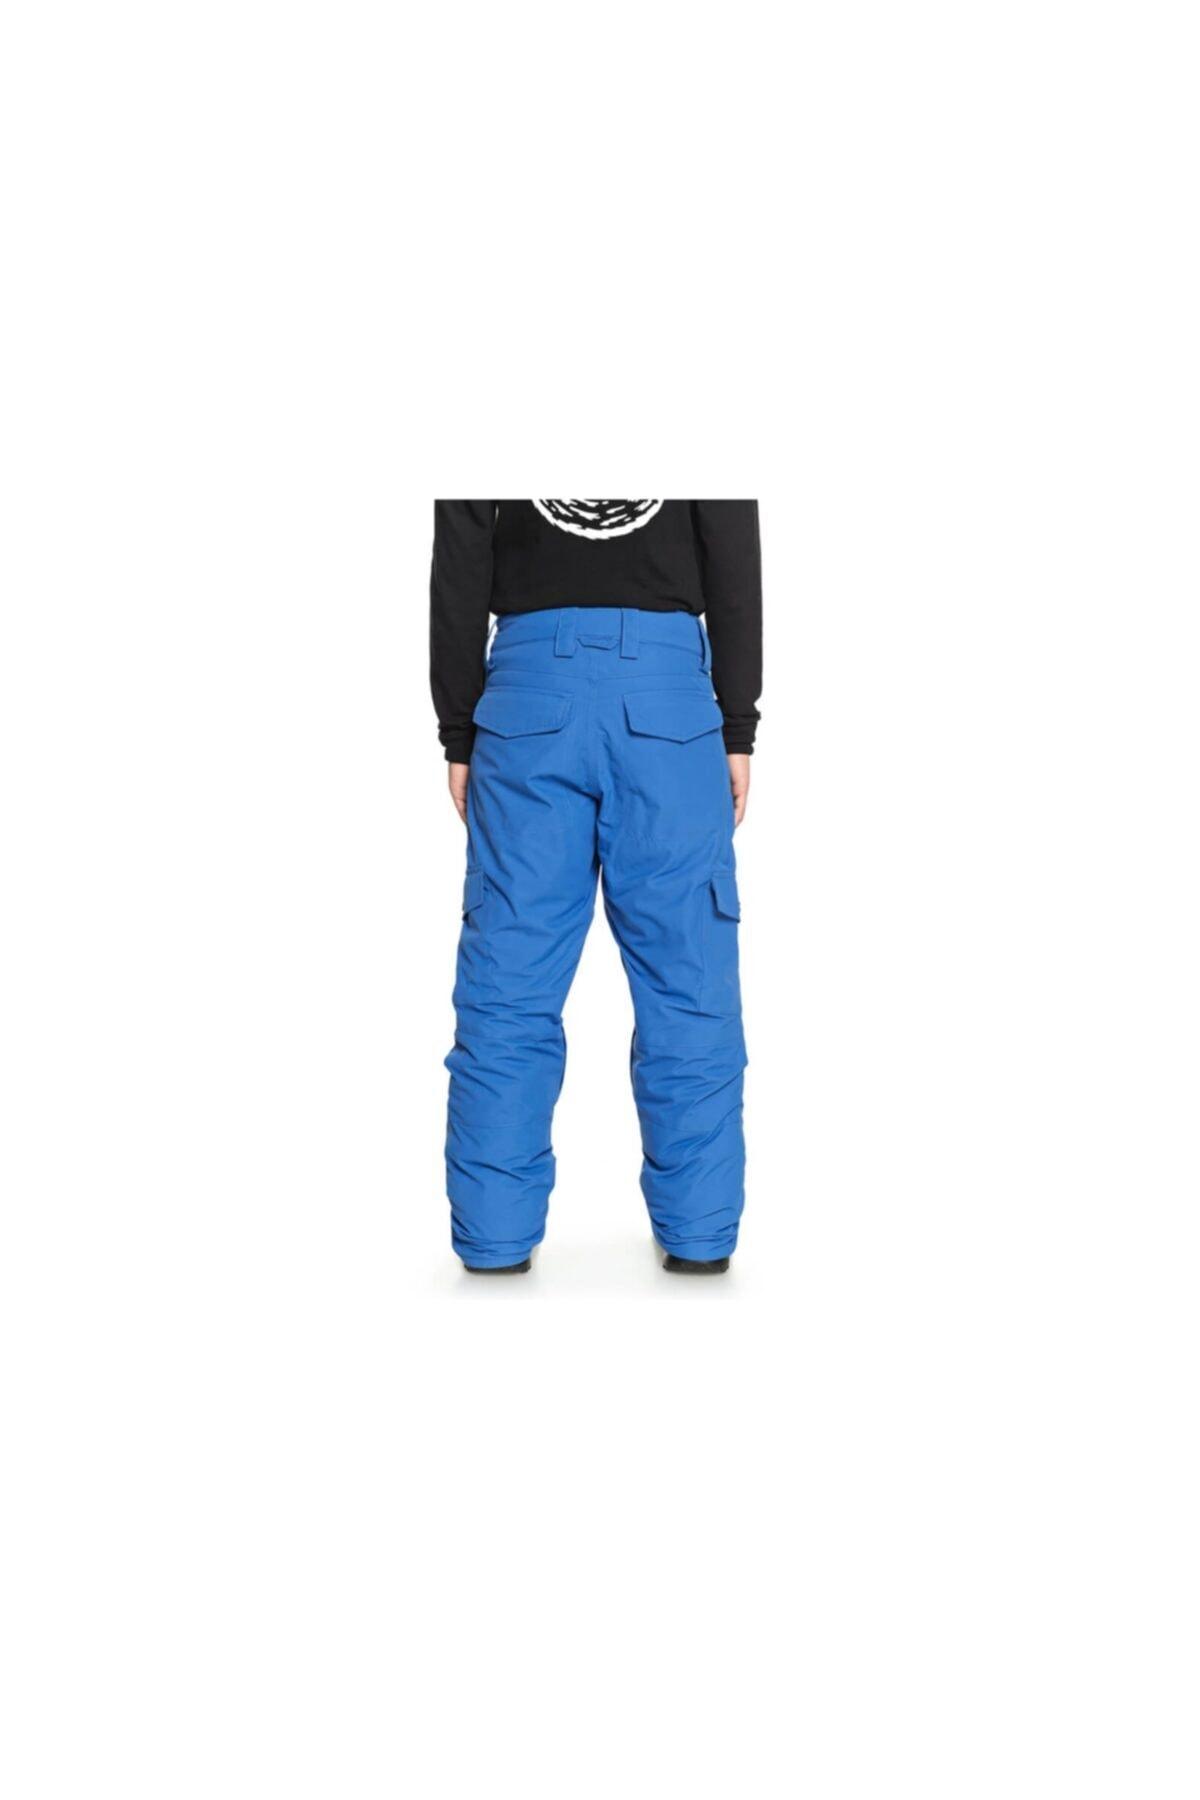 Quiksilver Çocuk  Mavi Porter Youth Kayak/snowboard Pantolonu 2